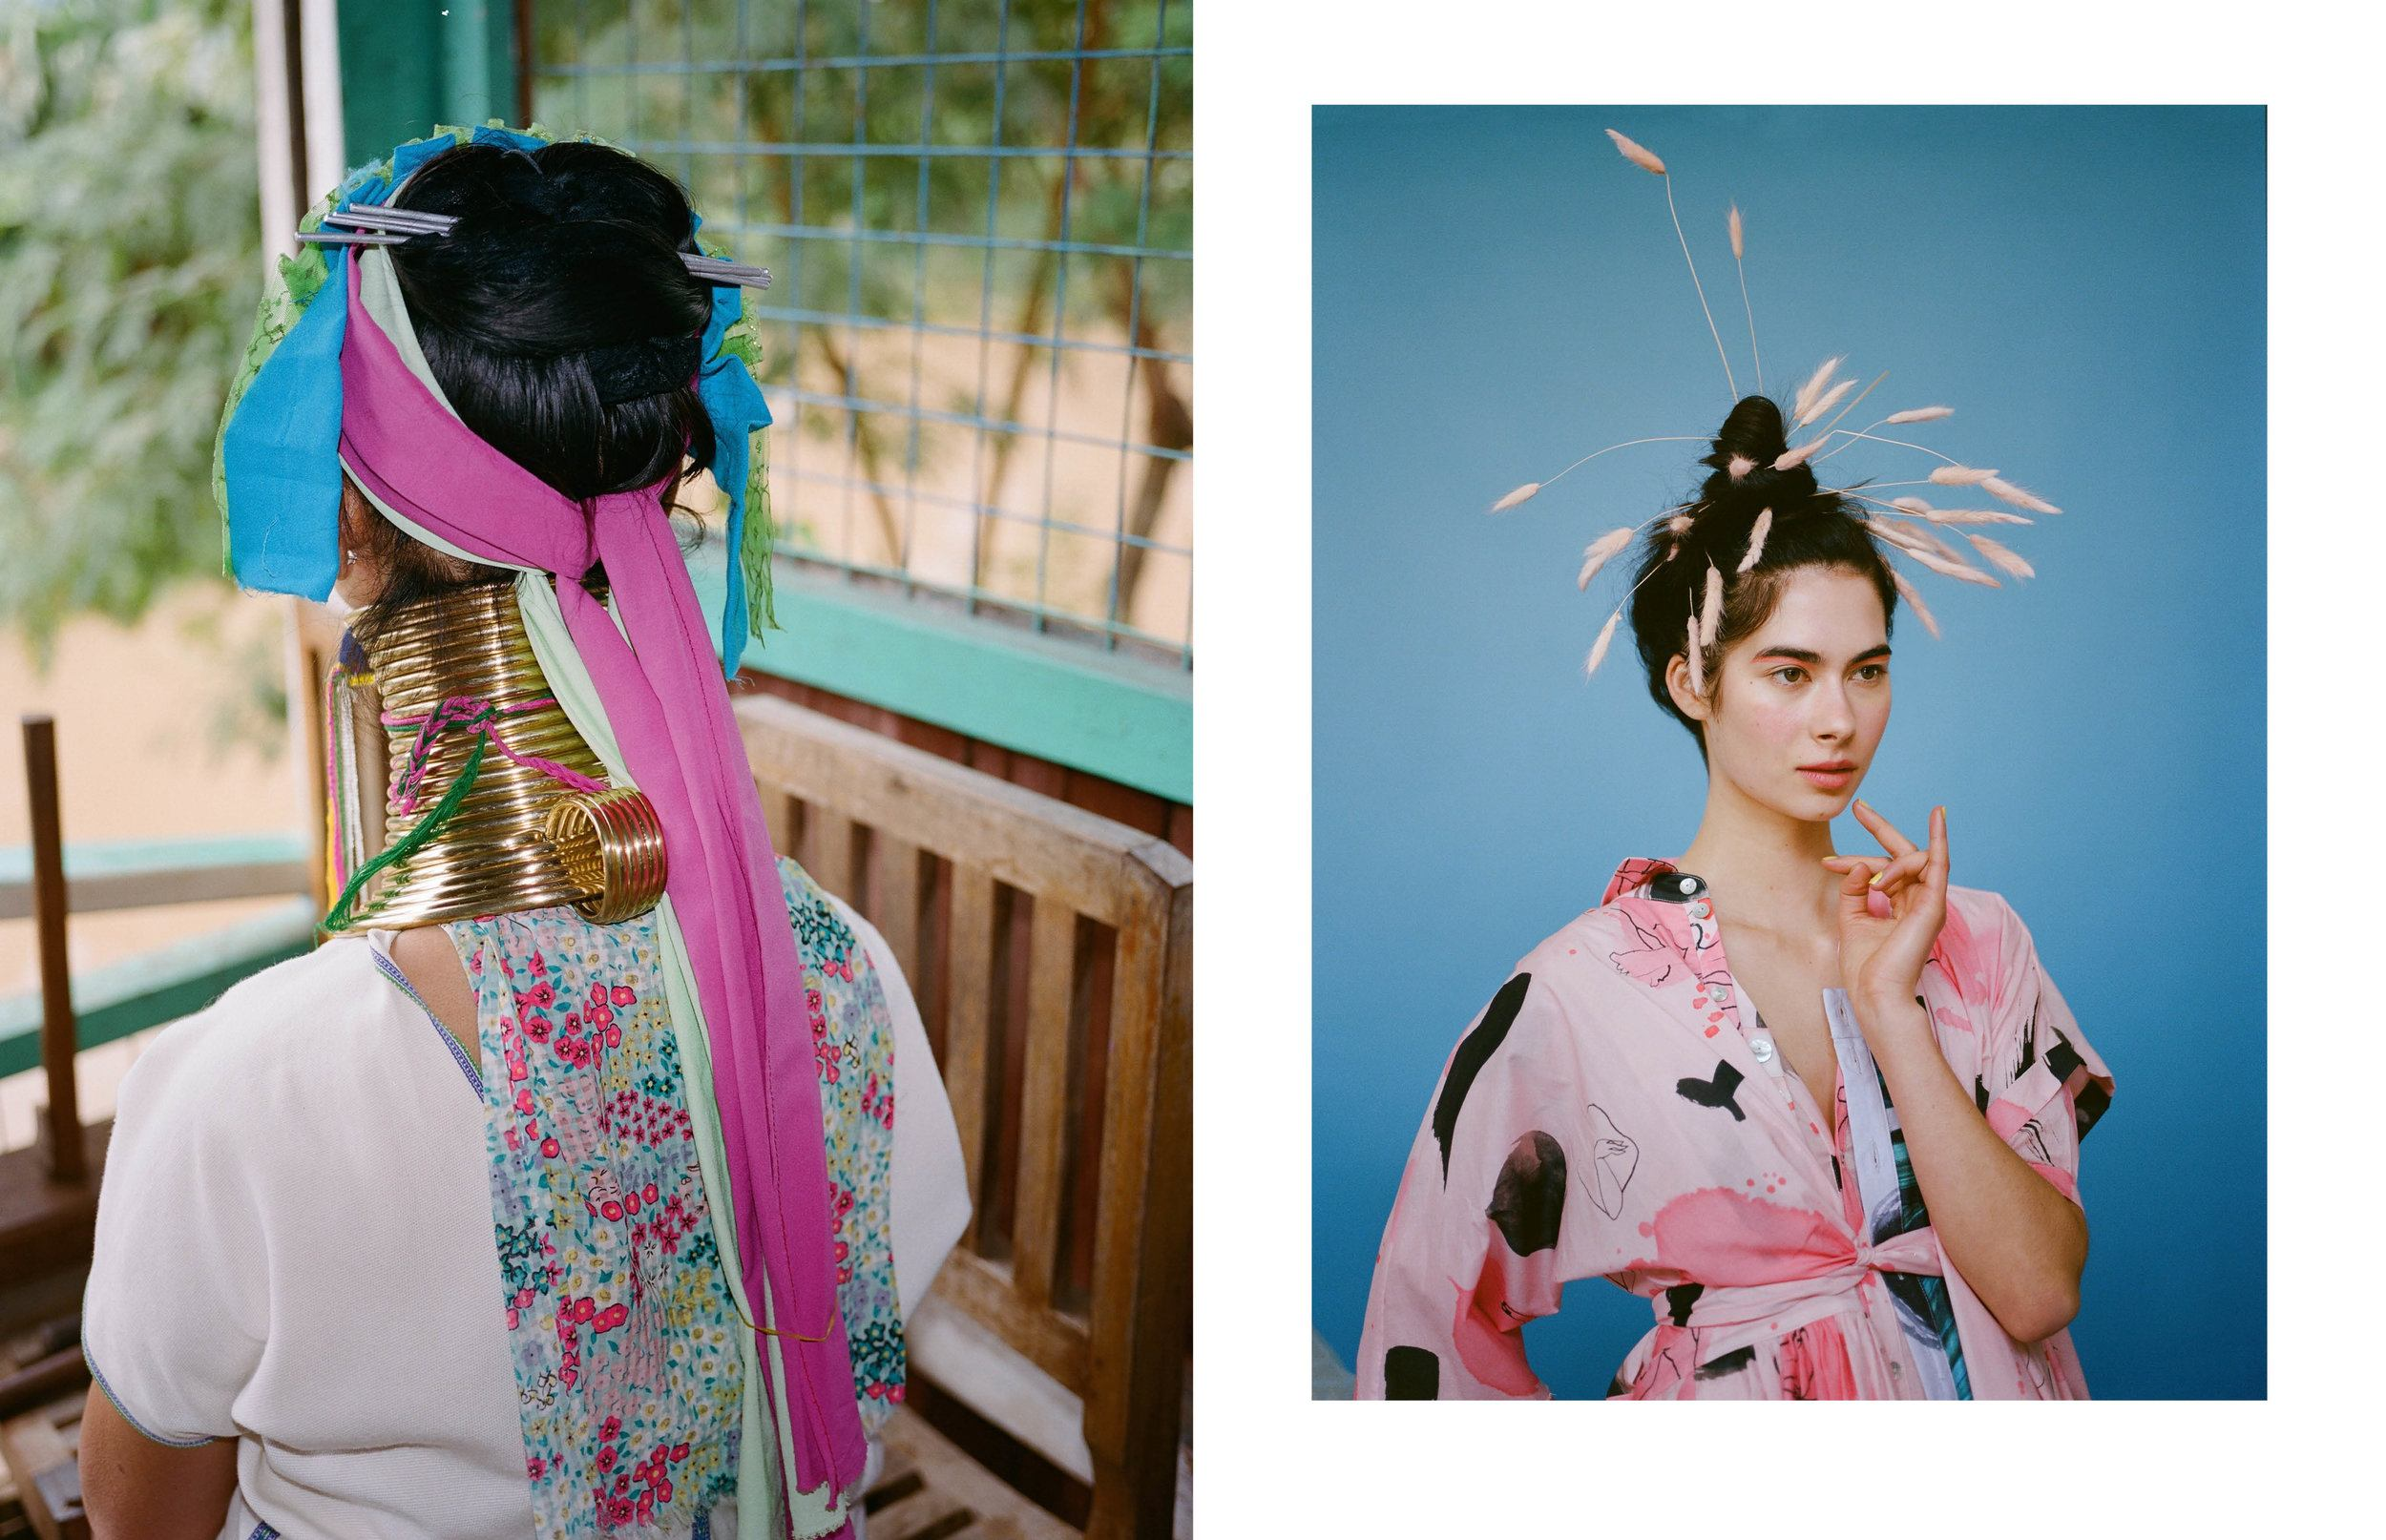 IGNANT-Photography-Olga-de-la-Iglesias-11